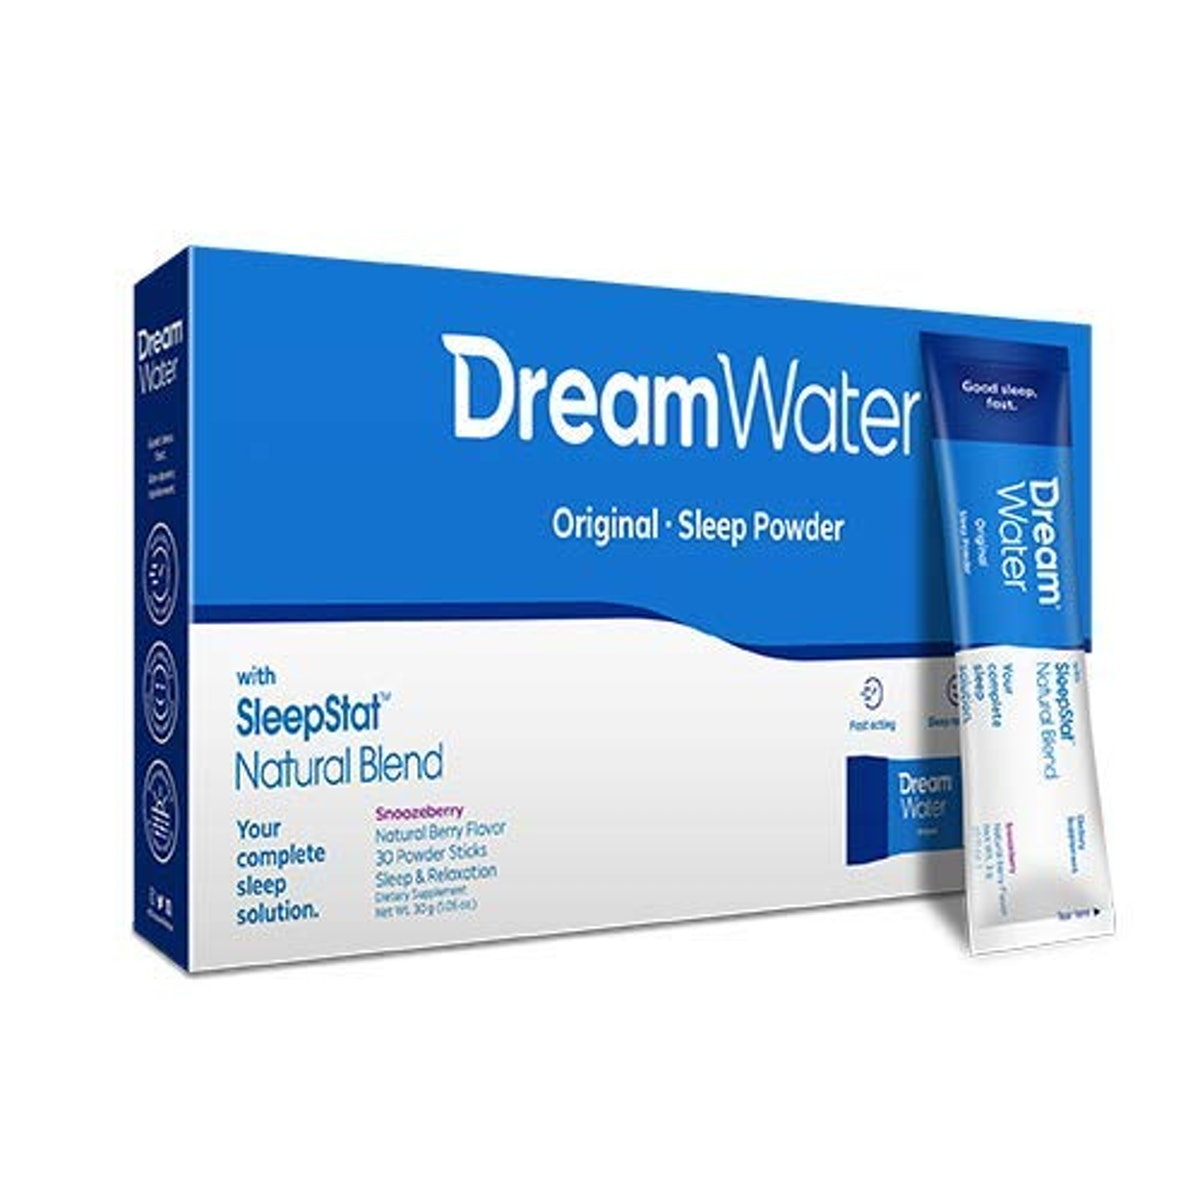 Dream Water Sleep Powder